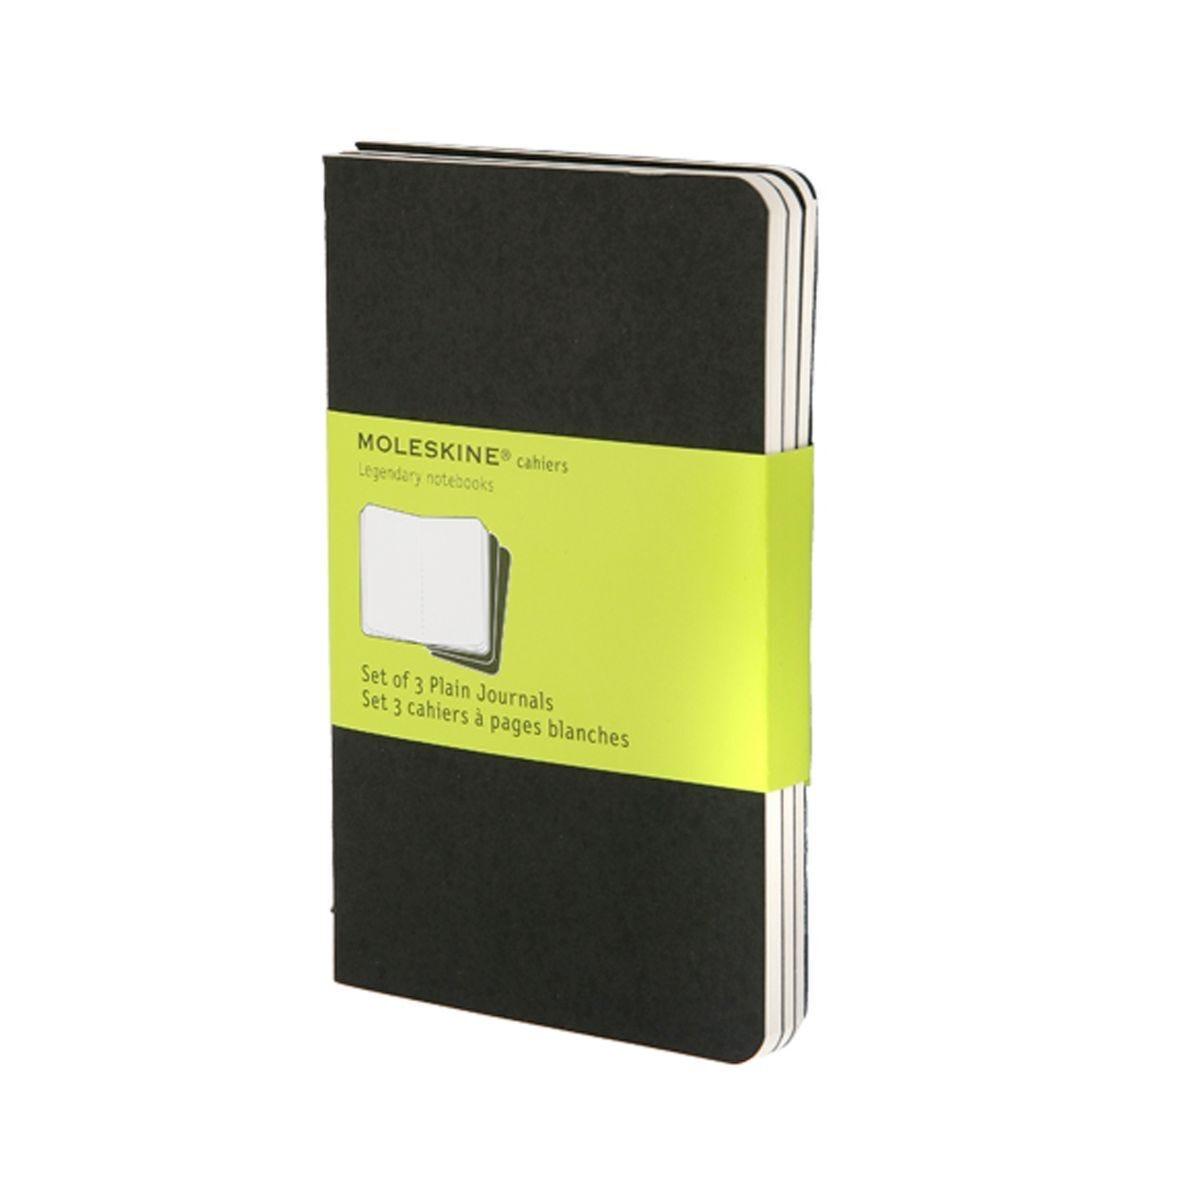 Moleskine Cahier Pocket Plain Journals Pack of 3 Black